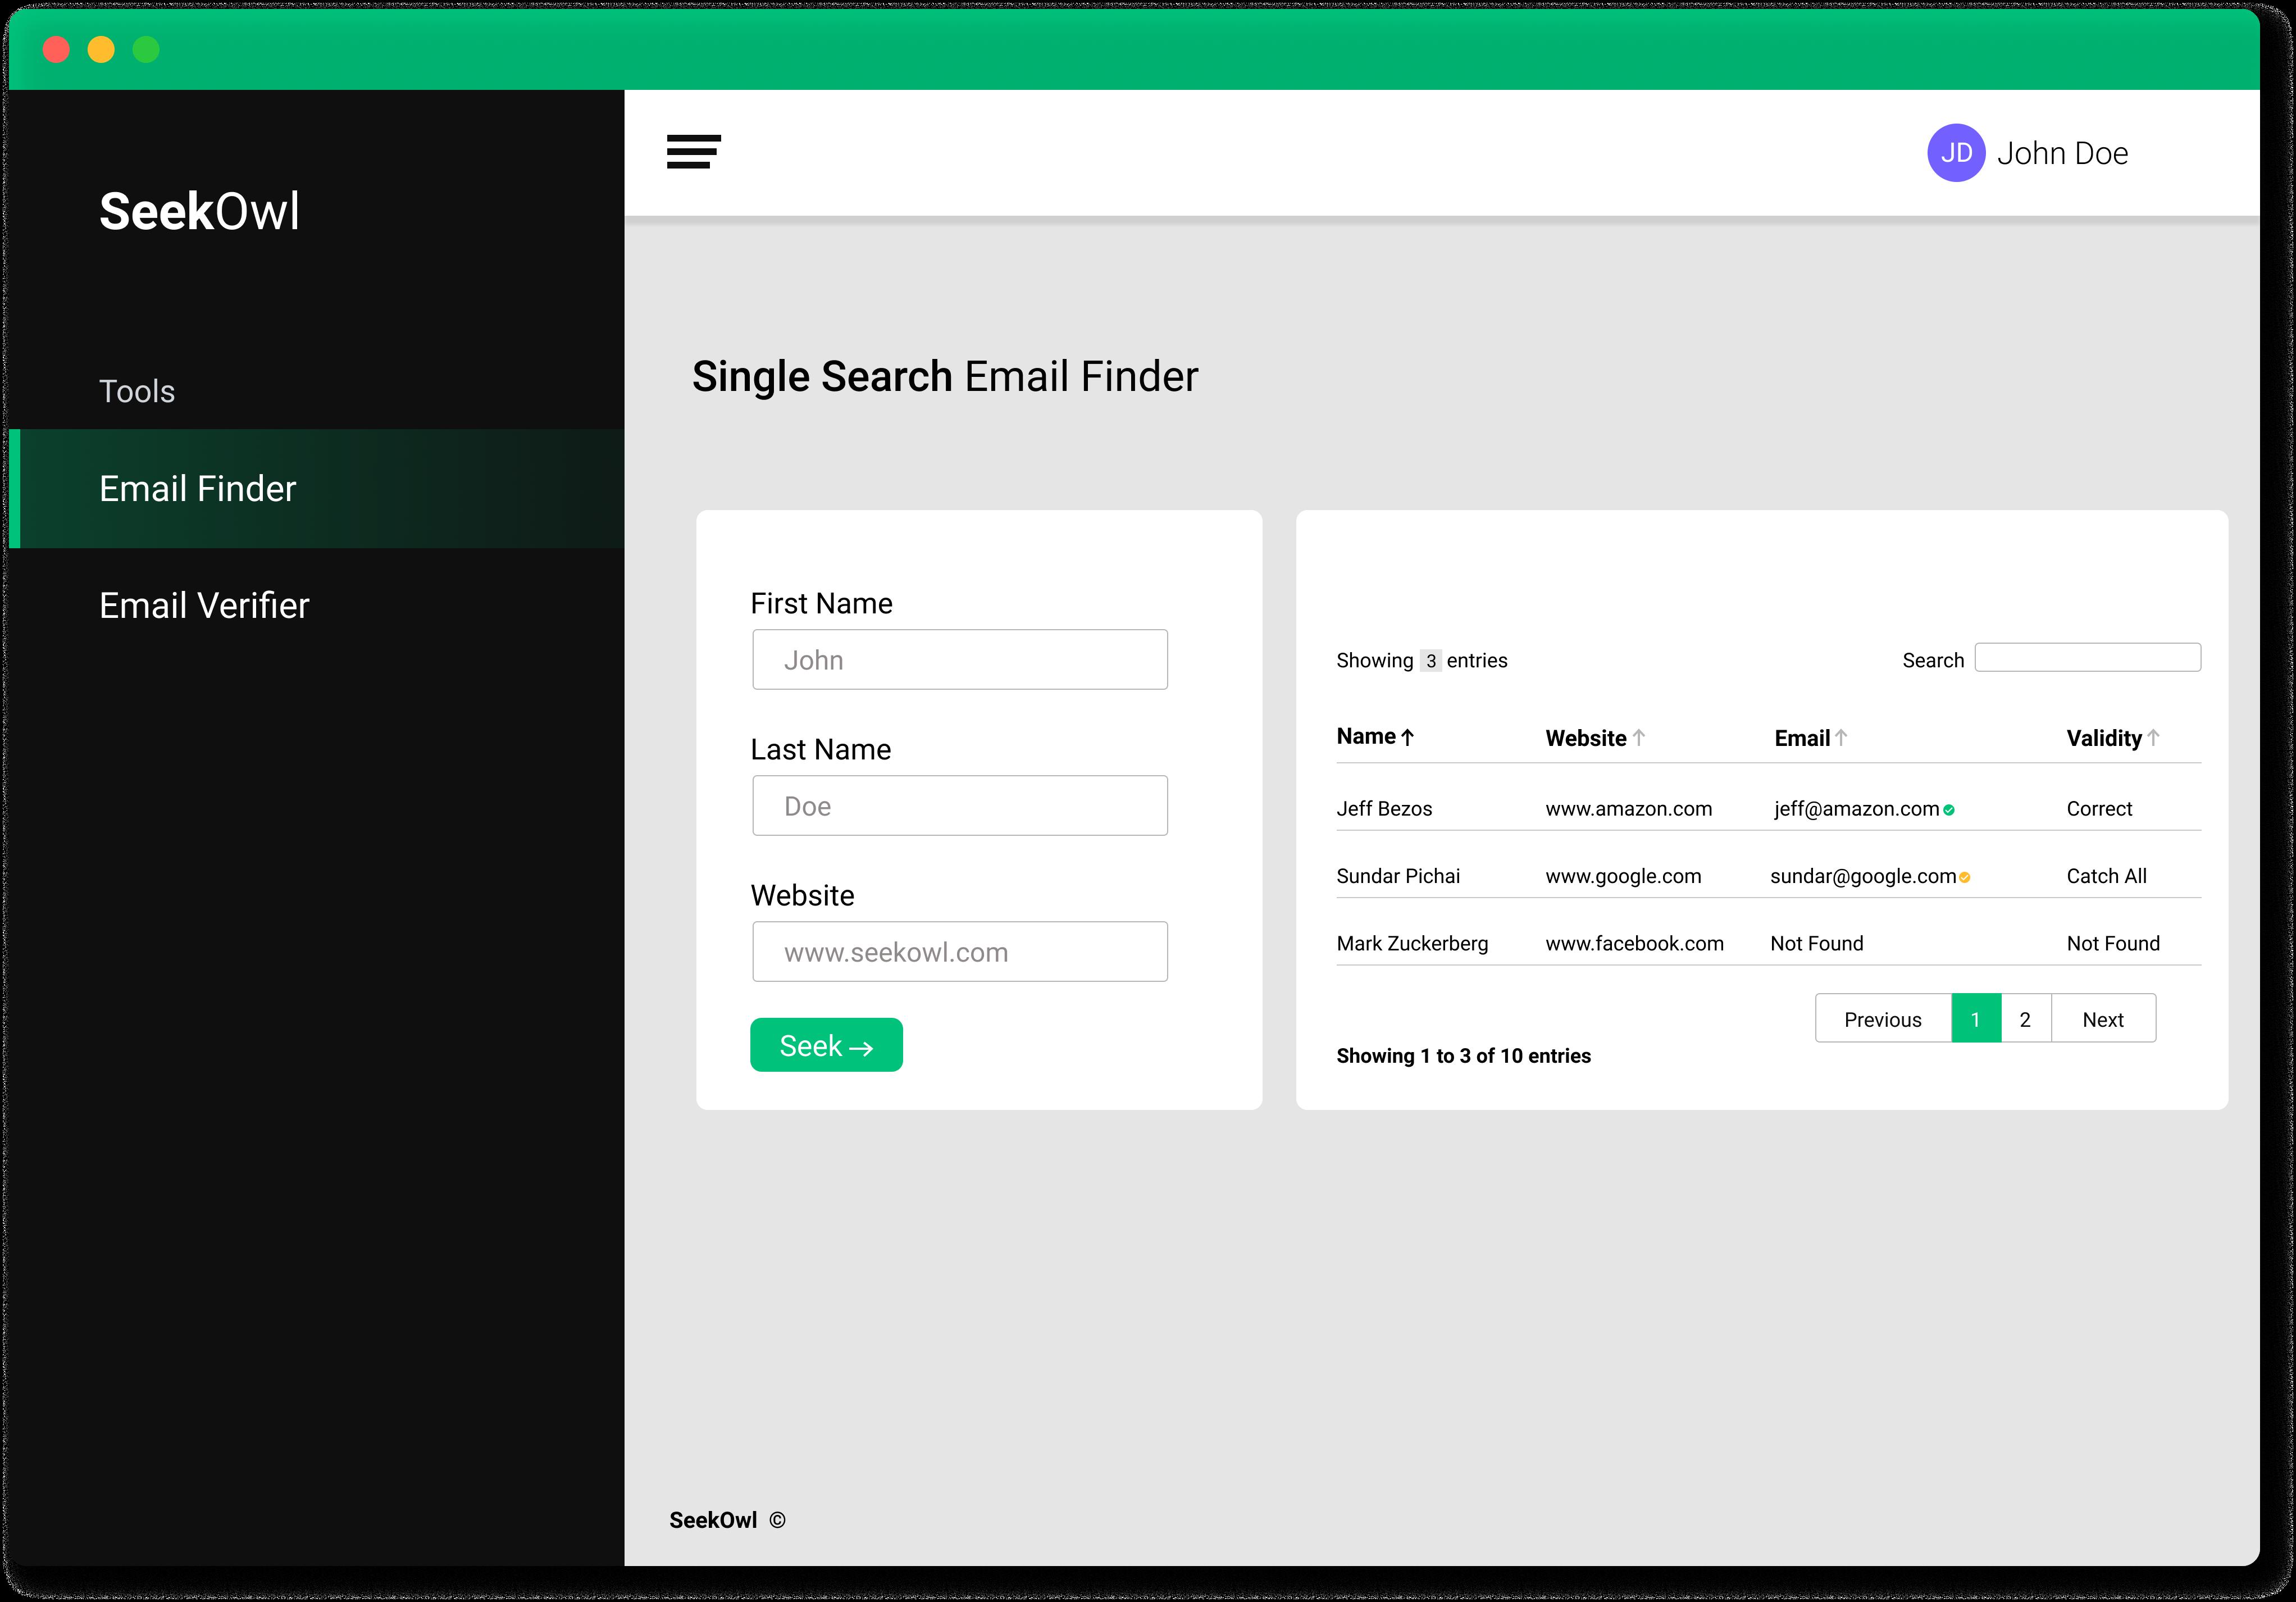 SeekOwl Single Work Email Finder Interface